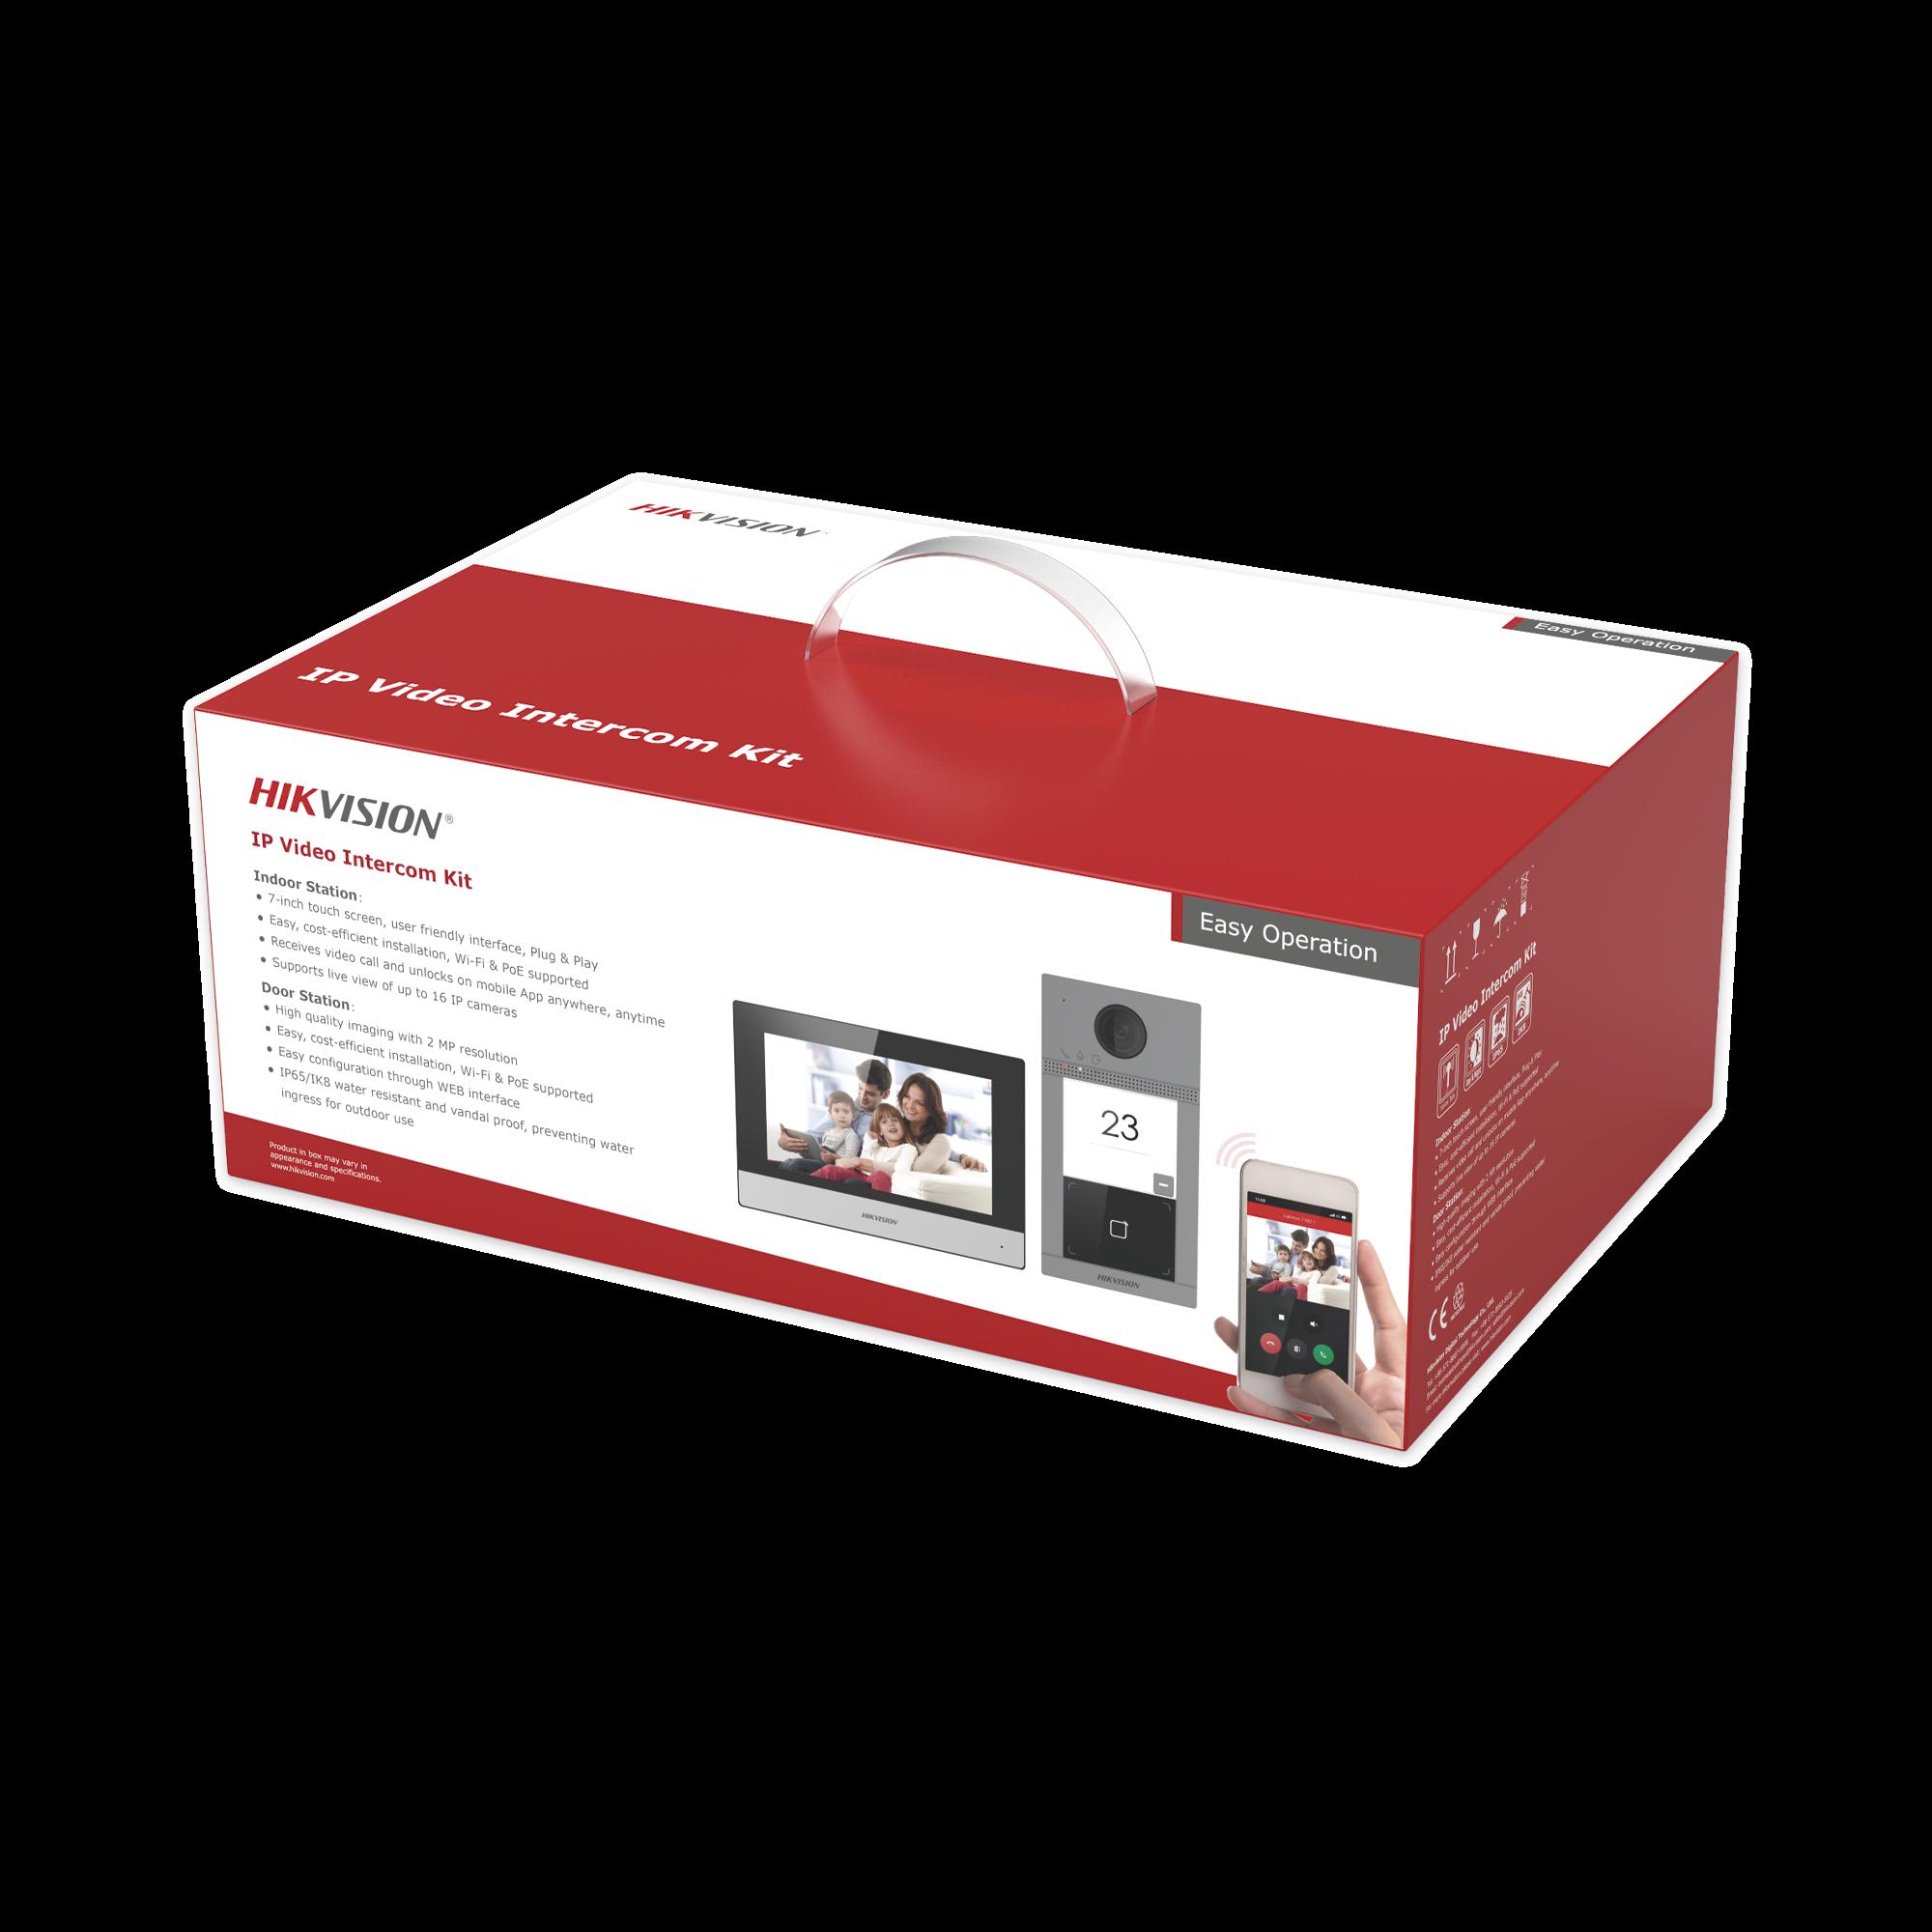 Kit de Videoportero IP WiFi con llamada a App de Smartphone (HikConnect) / Programacion por Interfaz Web / Frente de calle IK08 & IP65 / Soporta PoE